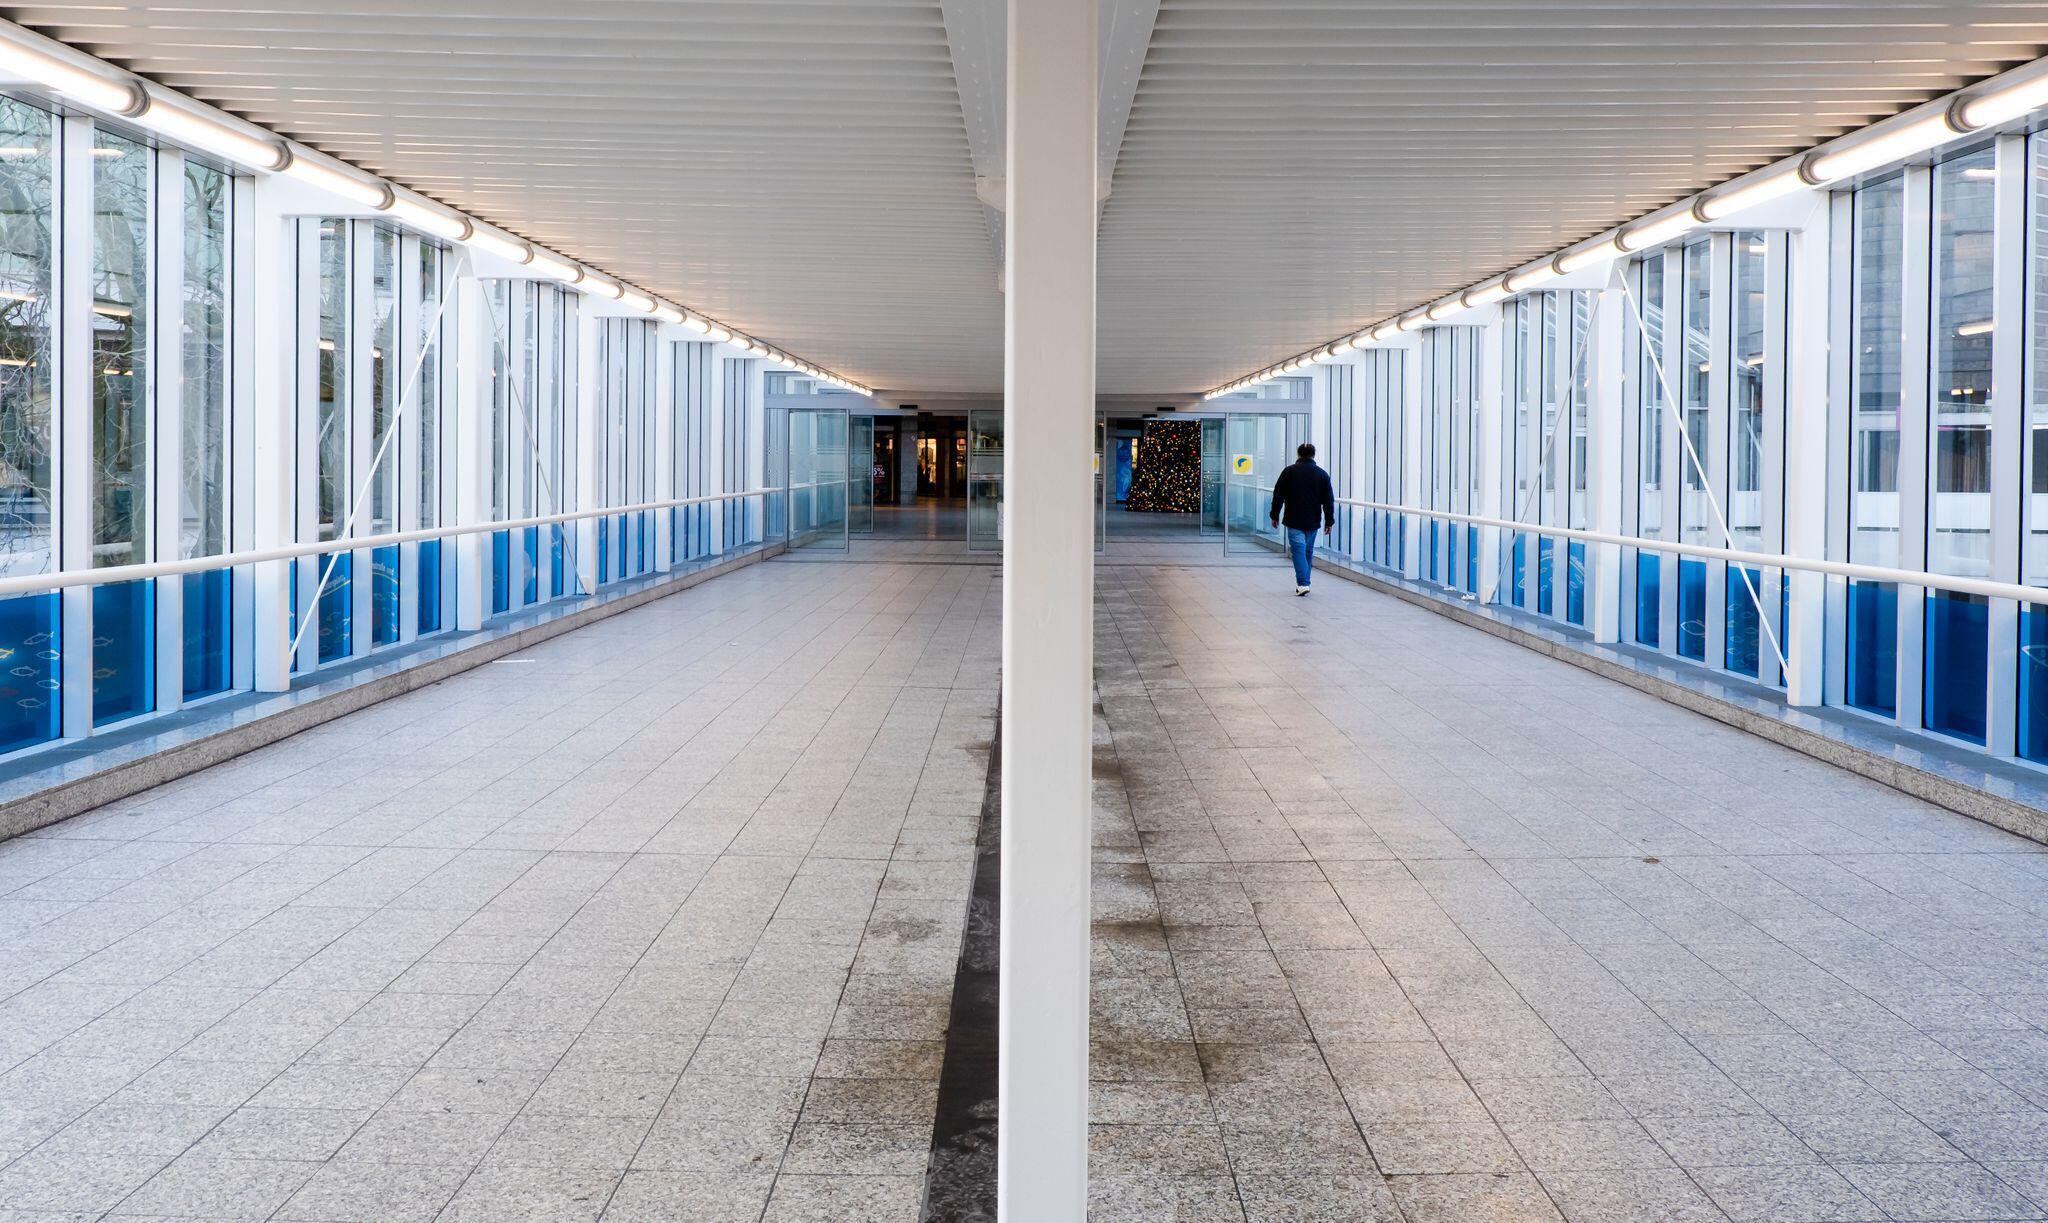 Bild zu Coronavirus - Lockdown - Kiel